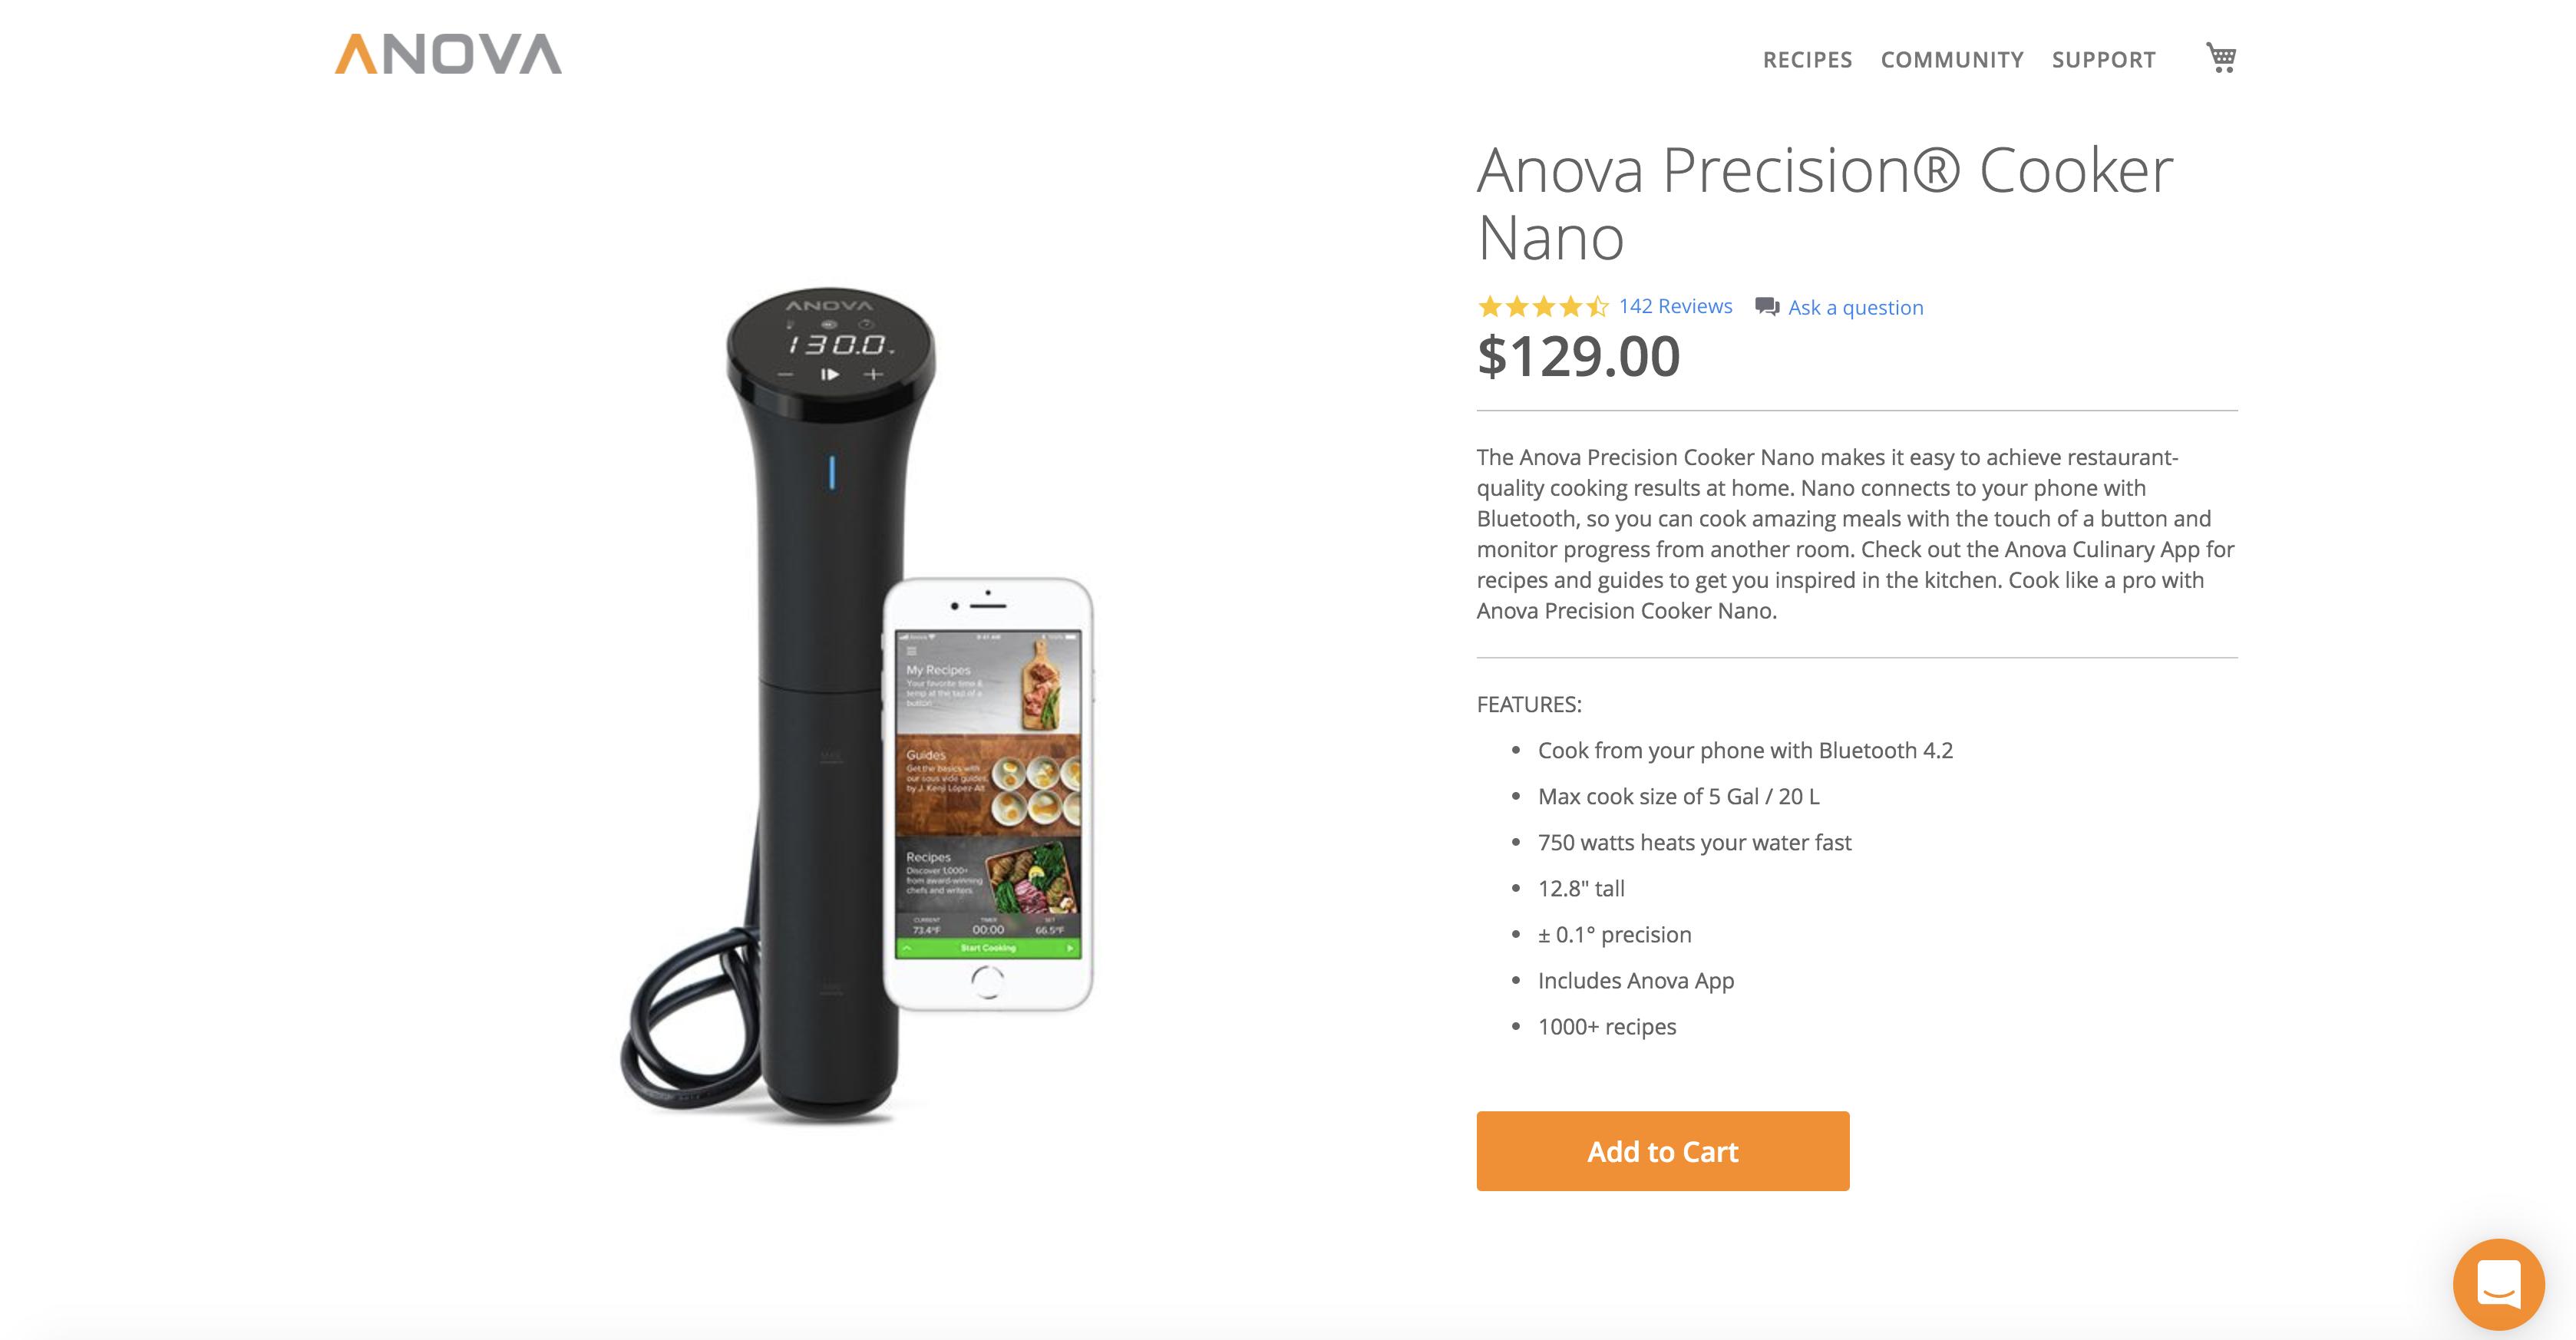 Anova Product Page